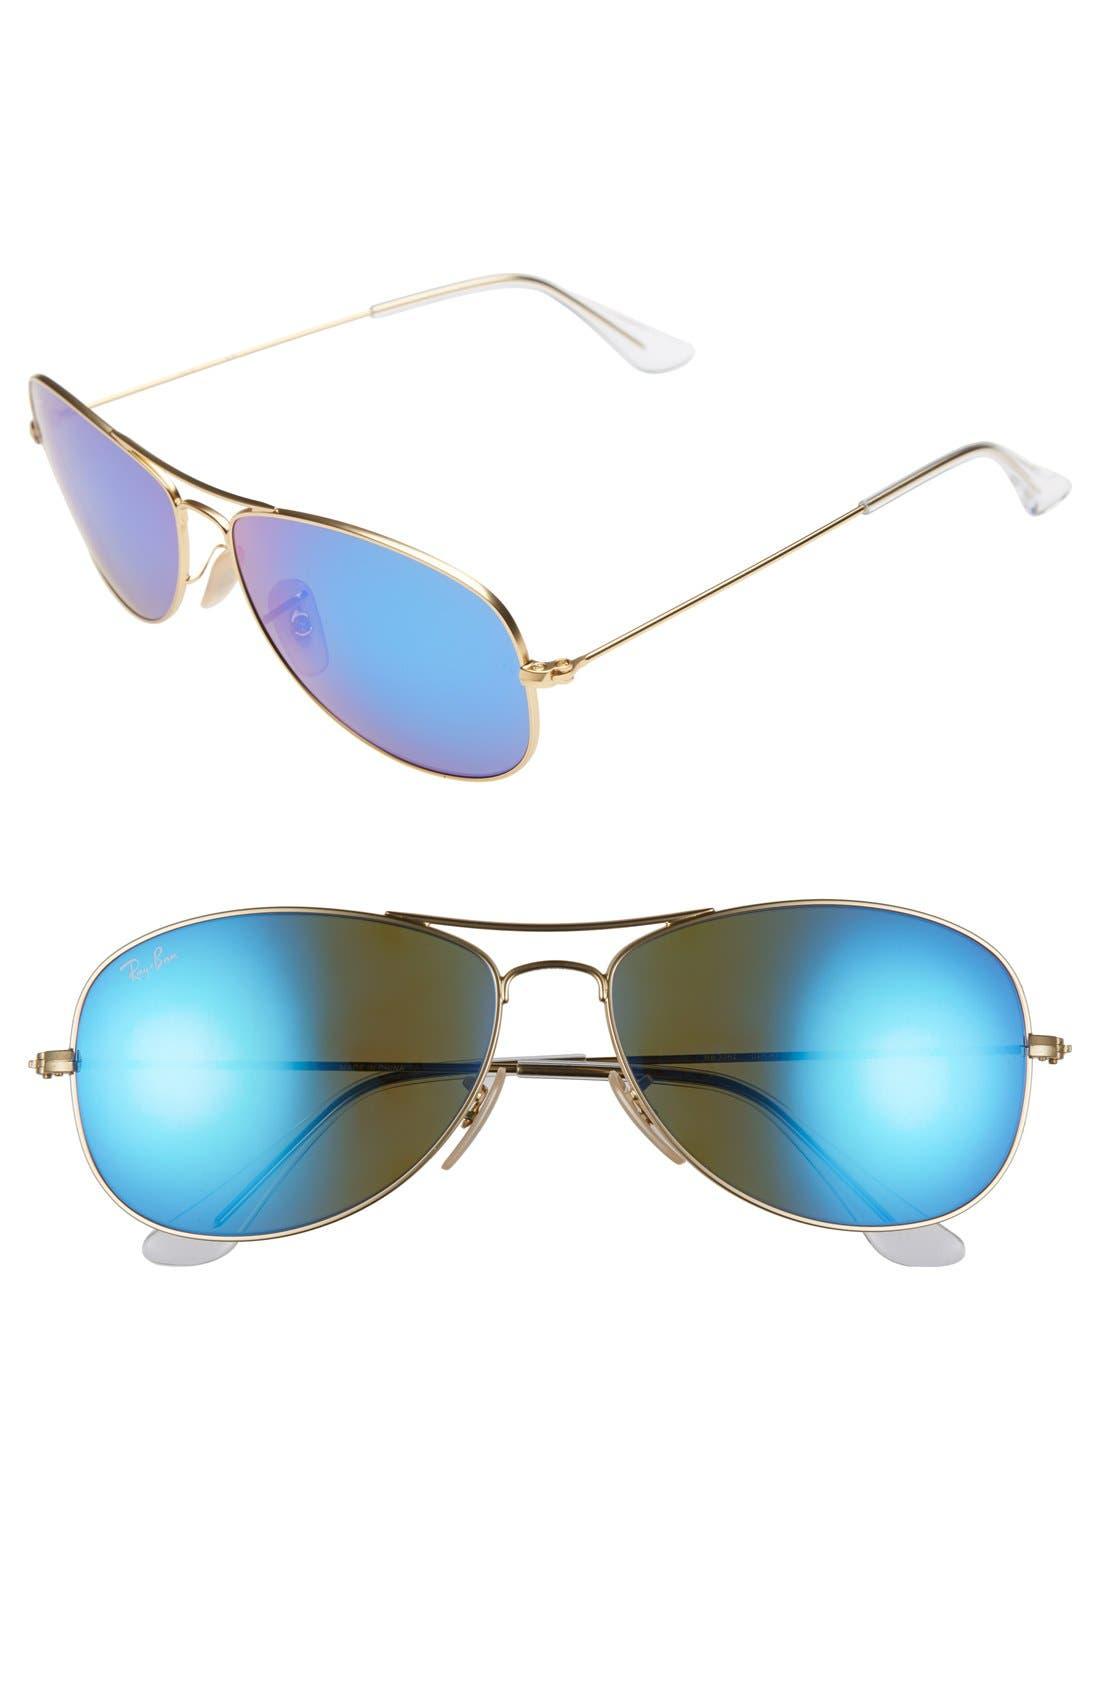 Main Image - Ray-Ban 'New Classic' 59mm Aviator Sunglasses